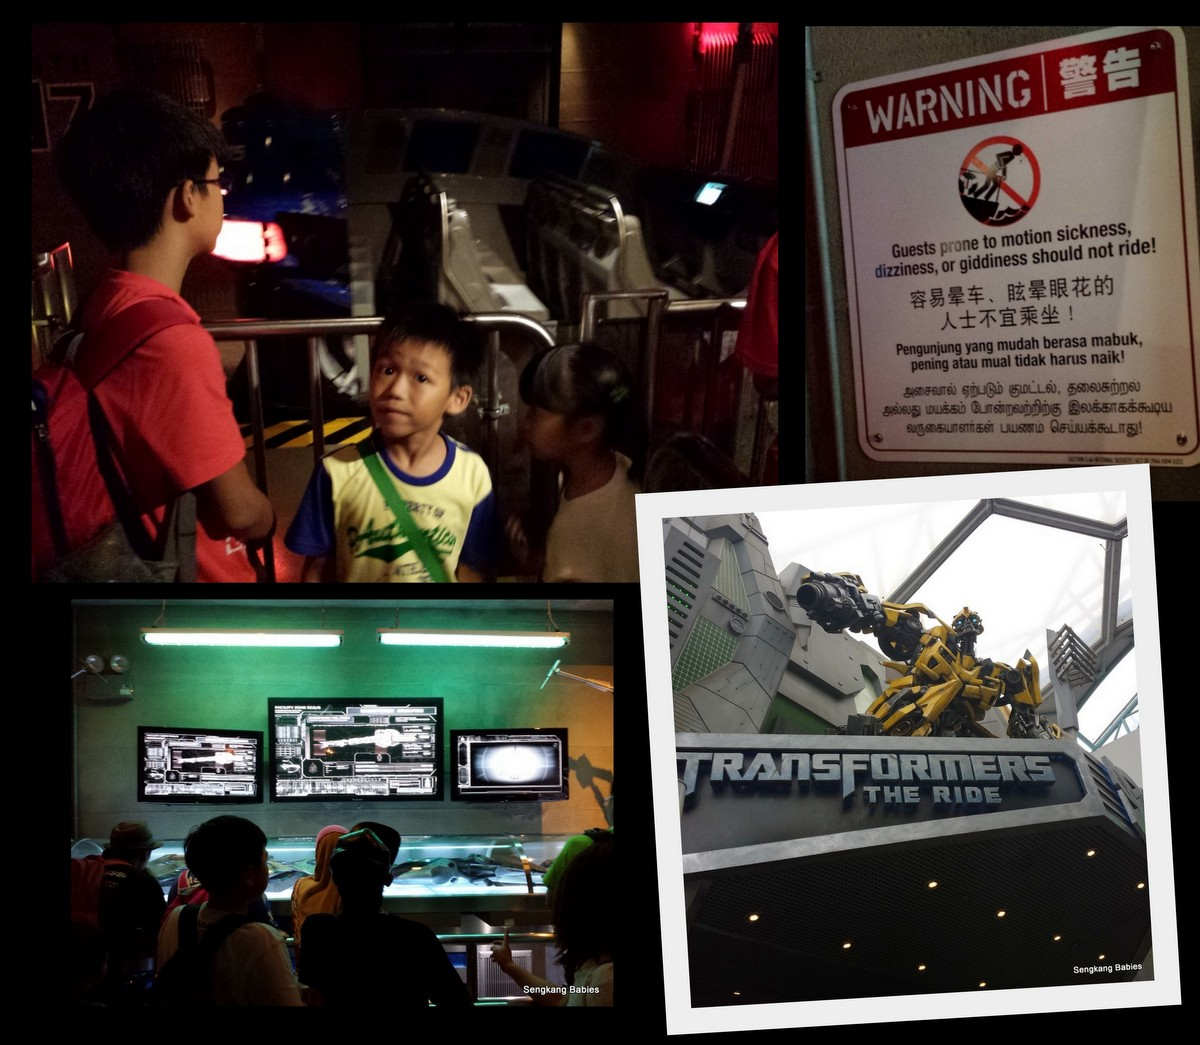 Transformer 3D ride Singapore, Uss Transformer